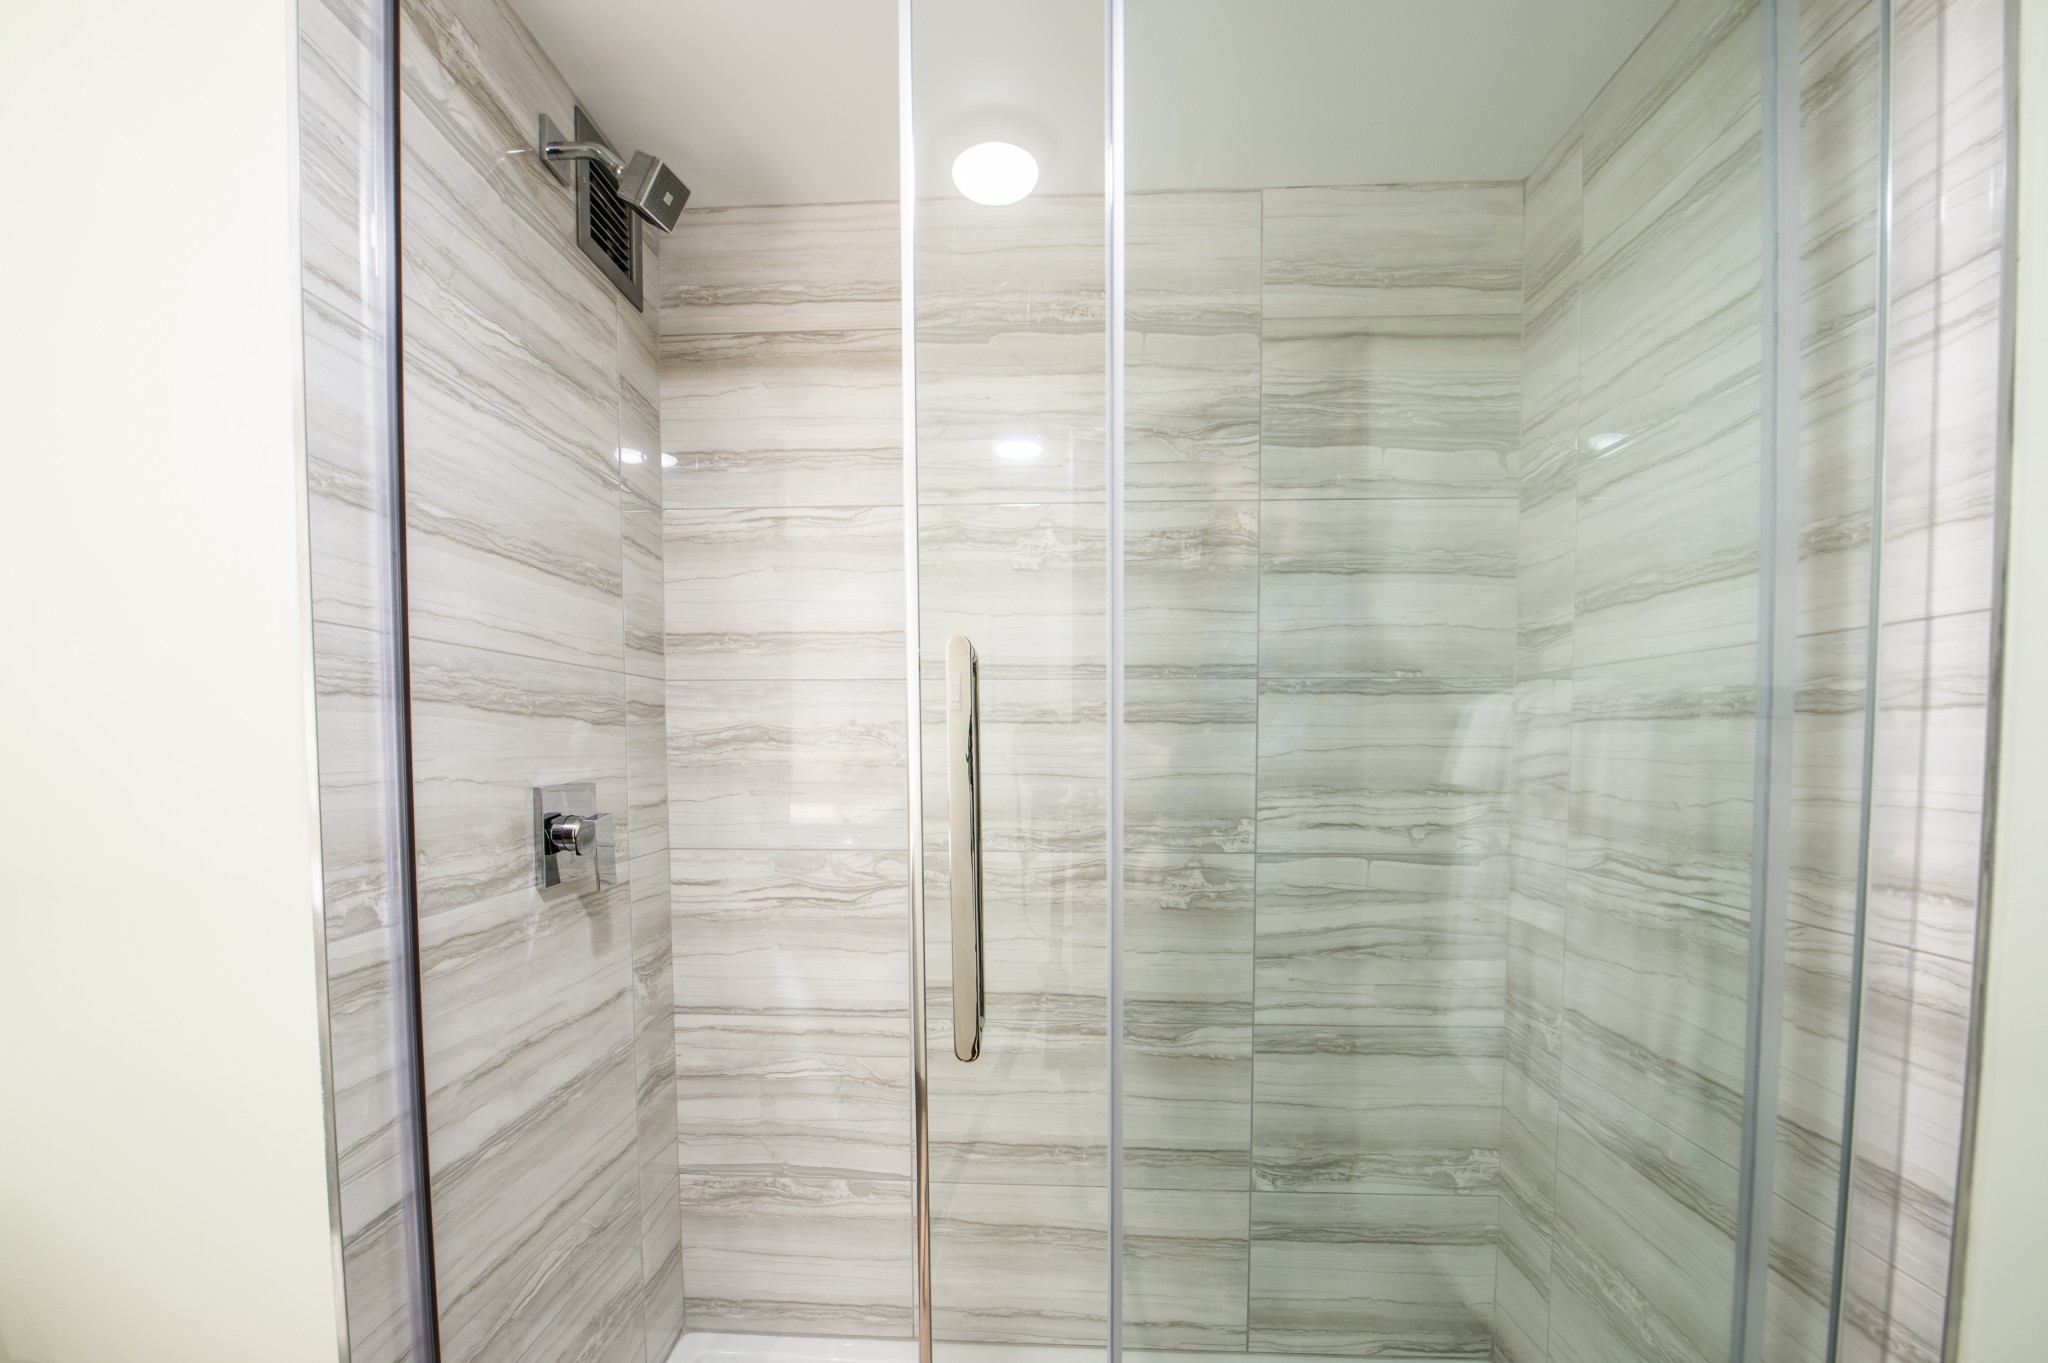 Rénovation hotel salle de bain